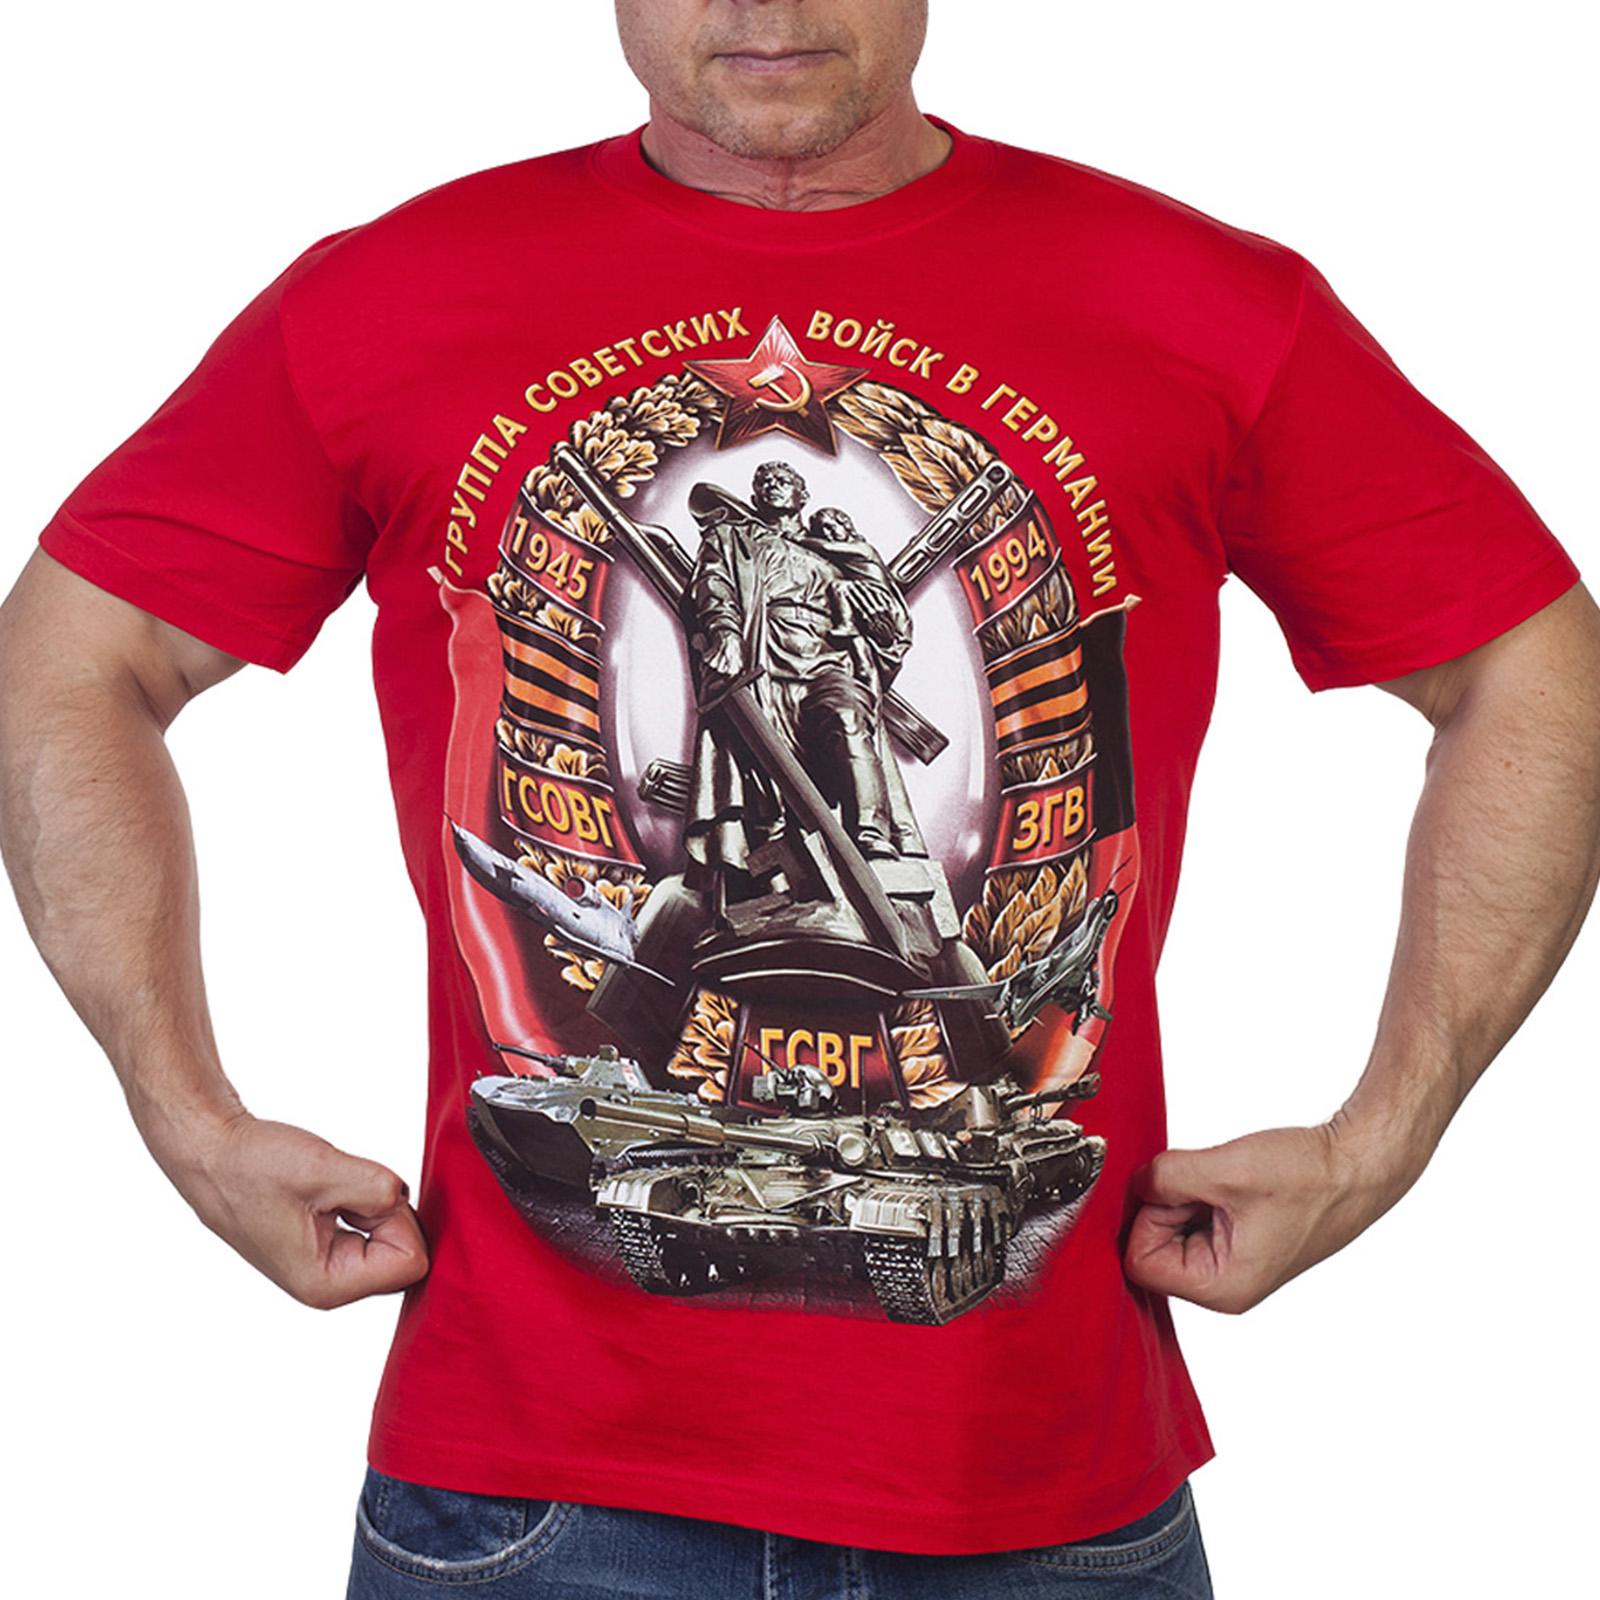 Красная мужская футболка ГСВГ-ЗГВ 1945-1994гг